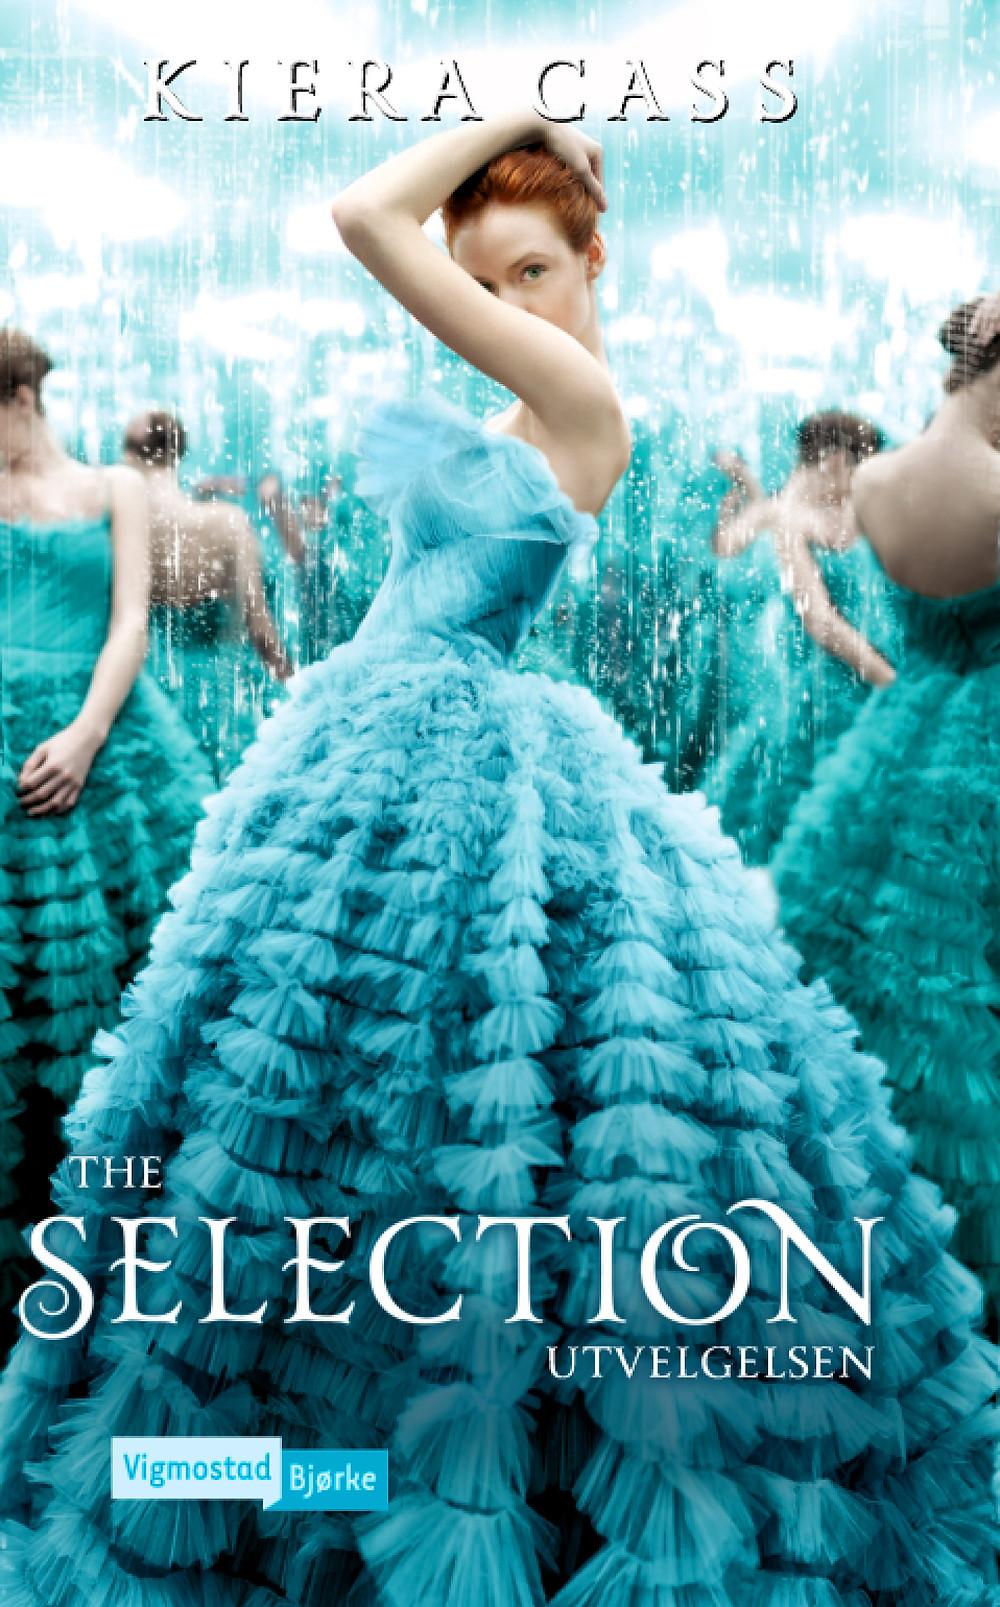 The Selection / Kiera Cass